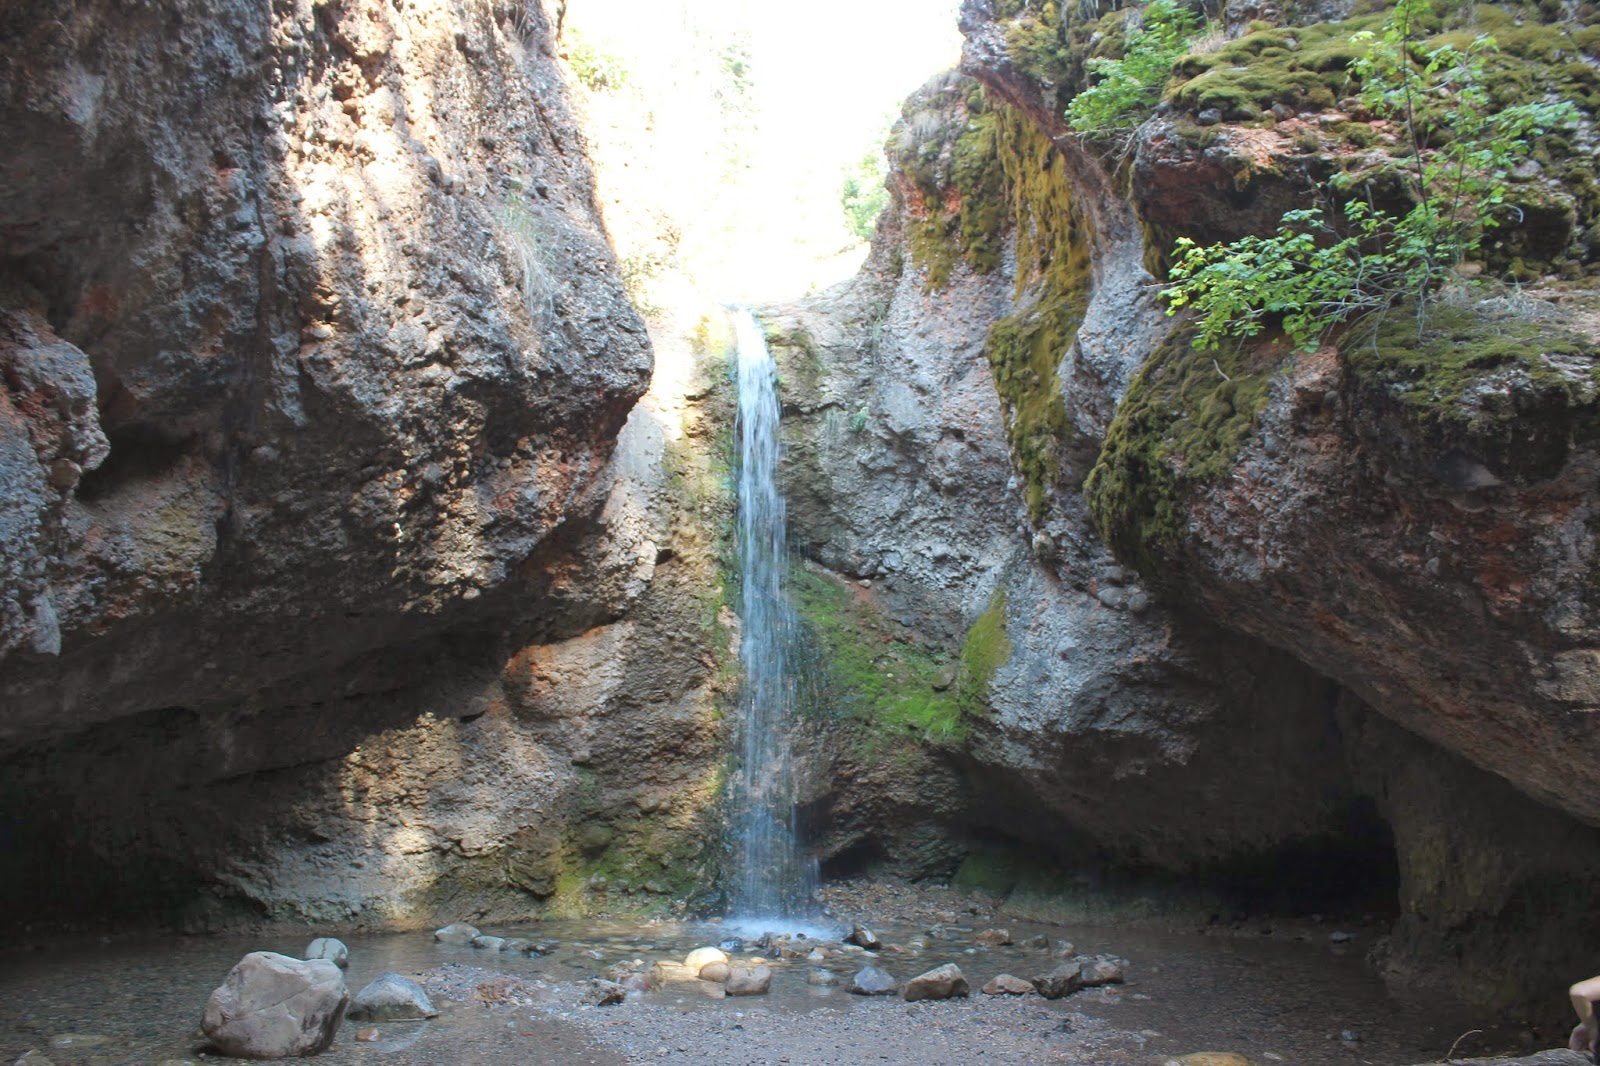 Gjhikes Com  Grotto Falls